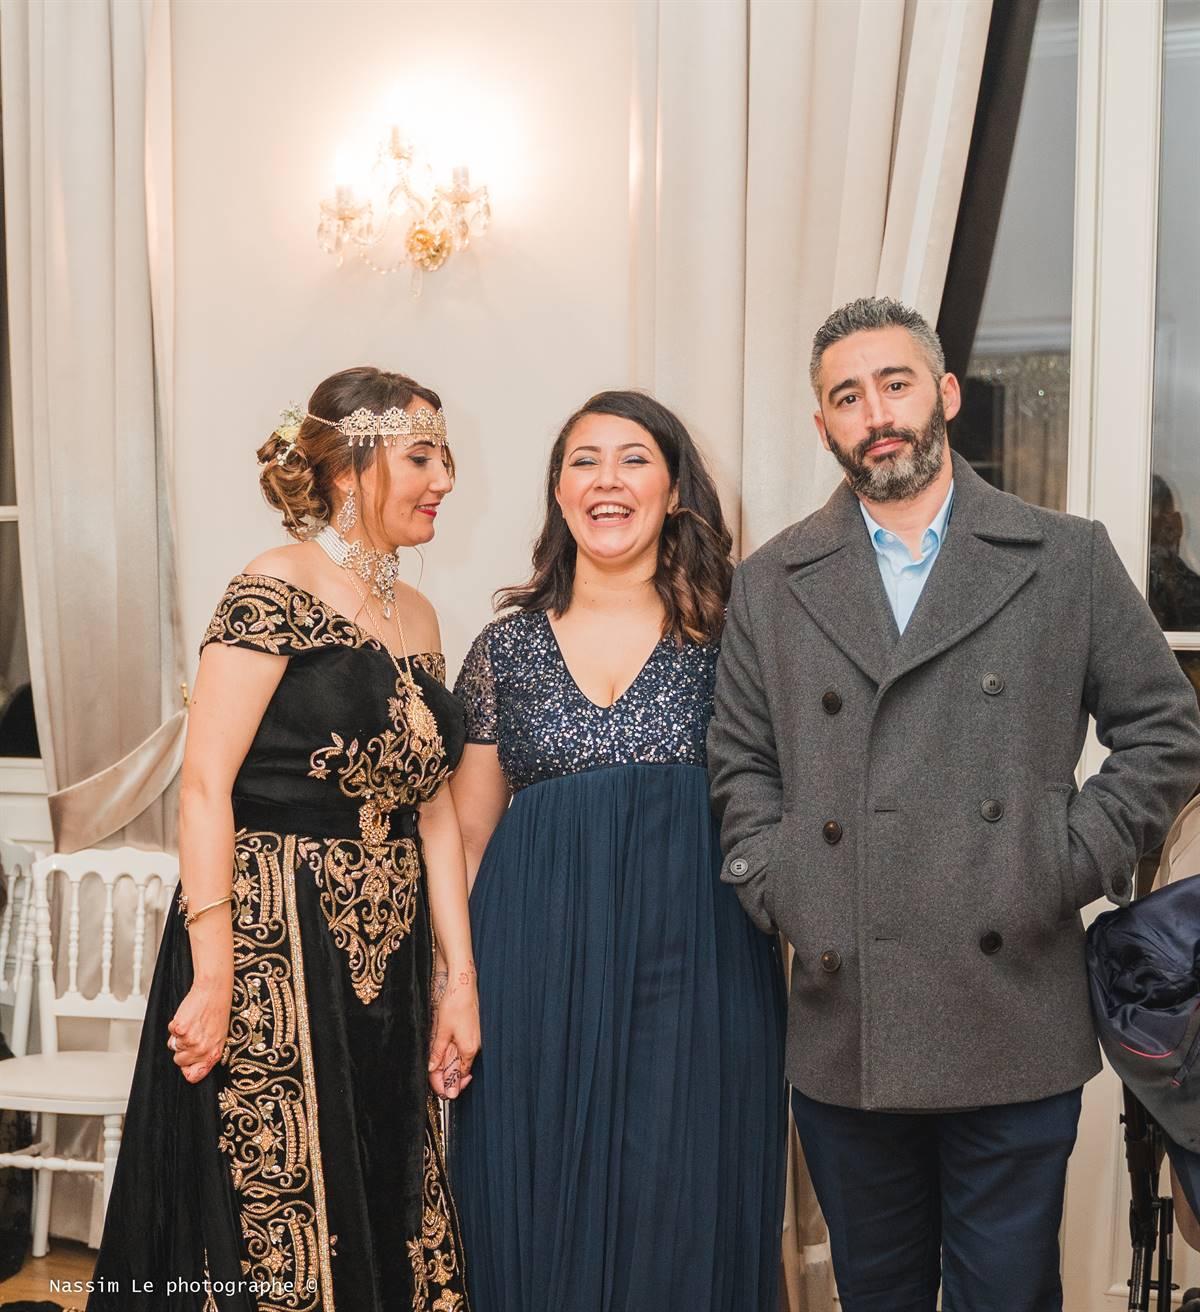 Pourquoi choisir ce Photographe mariage oriental 94